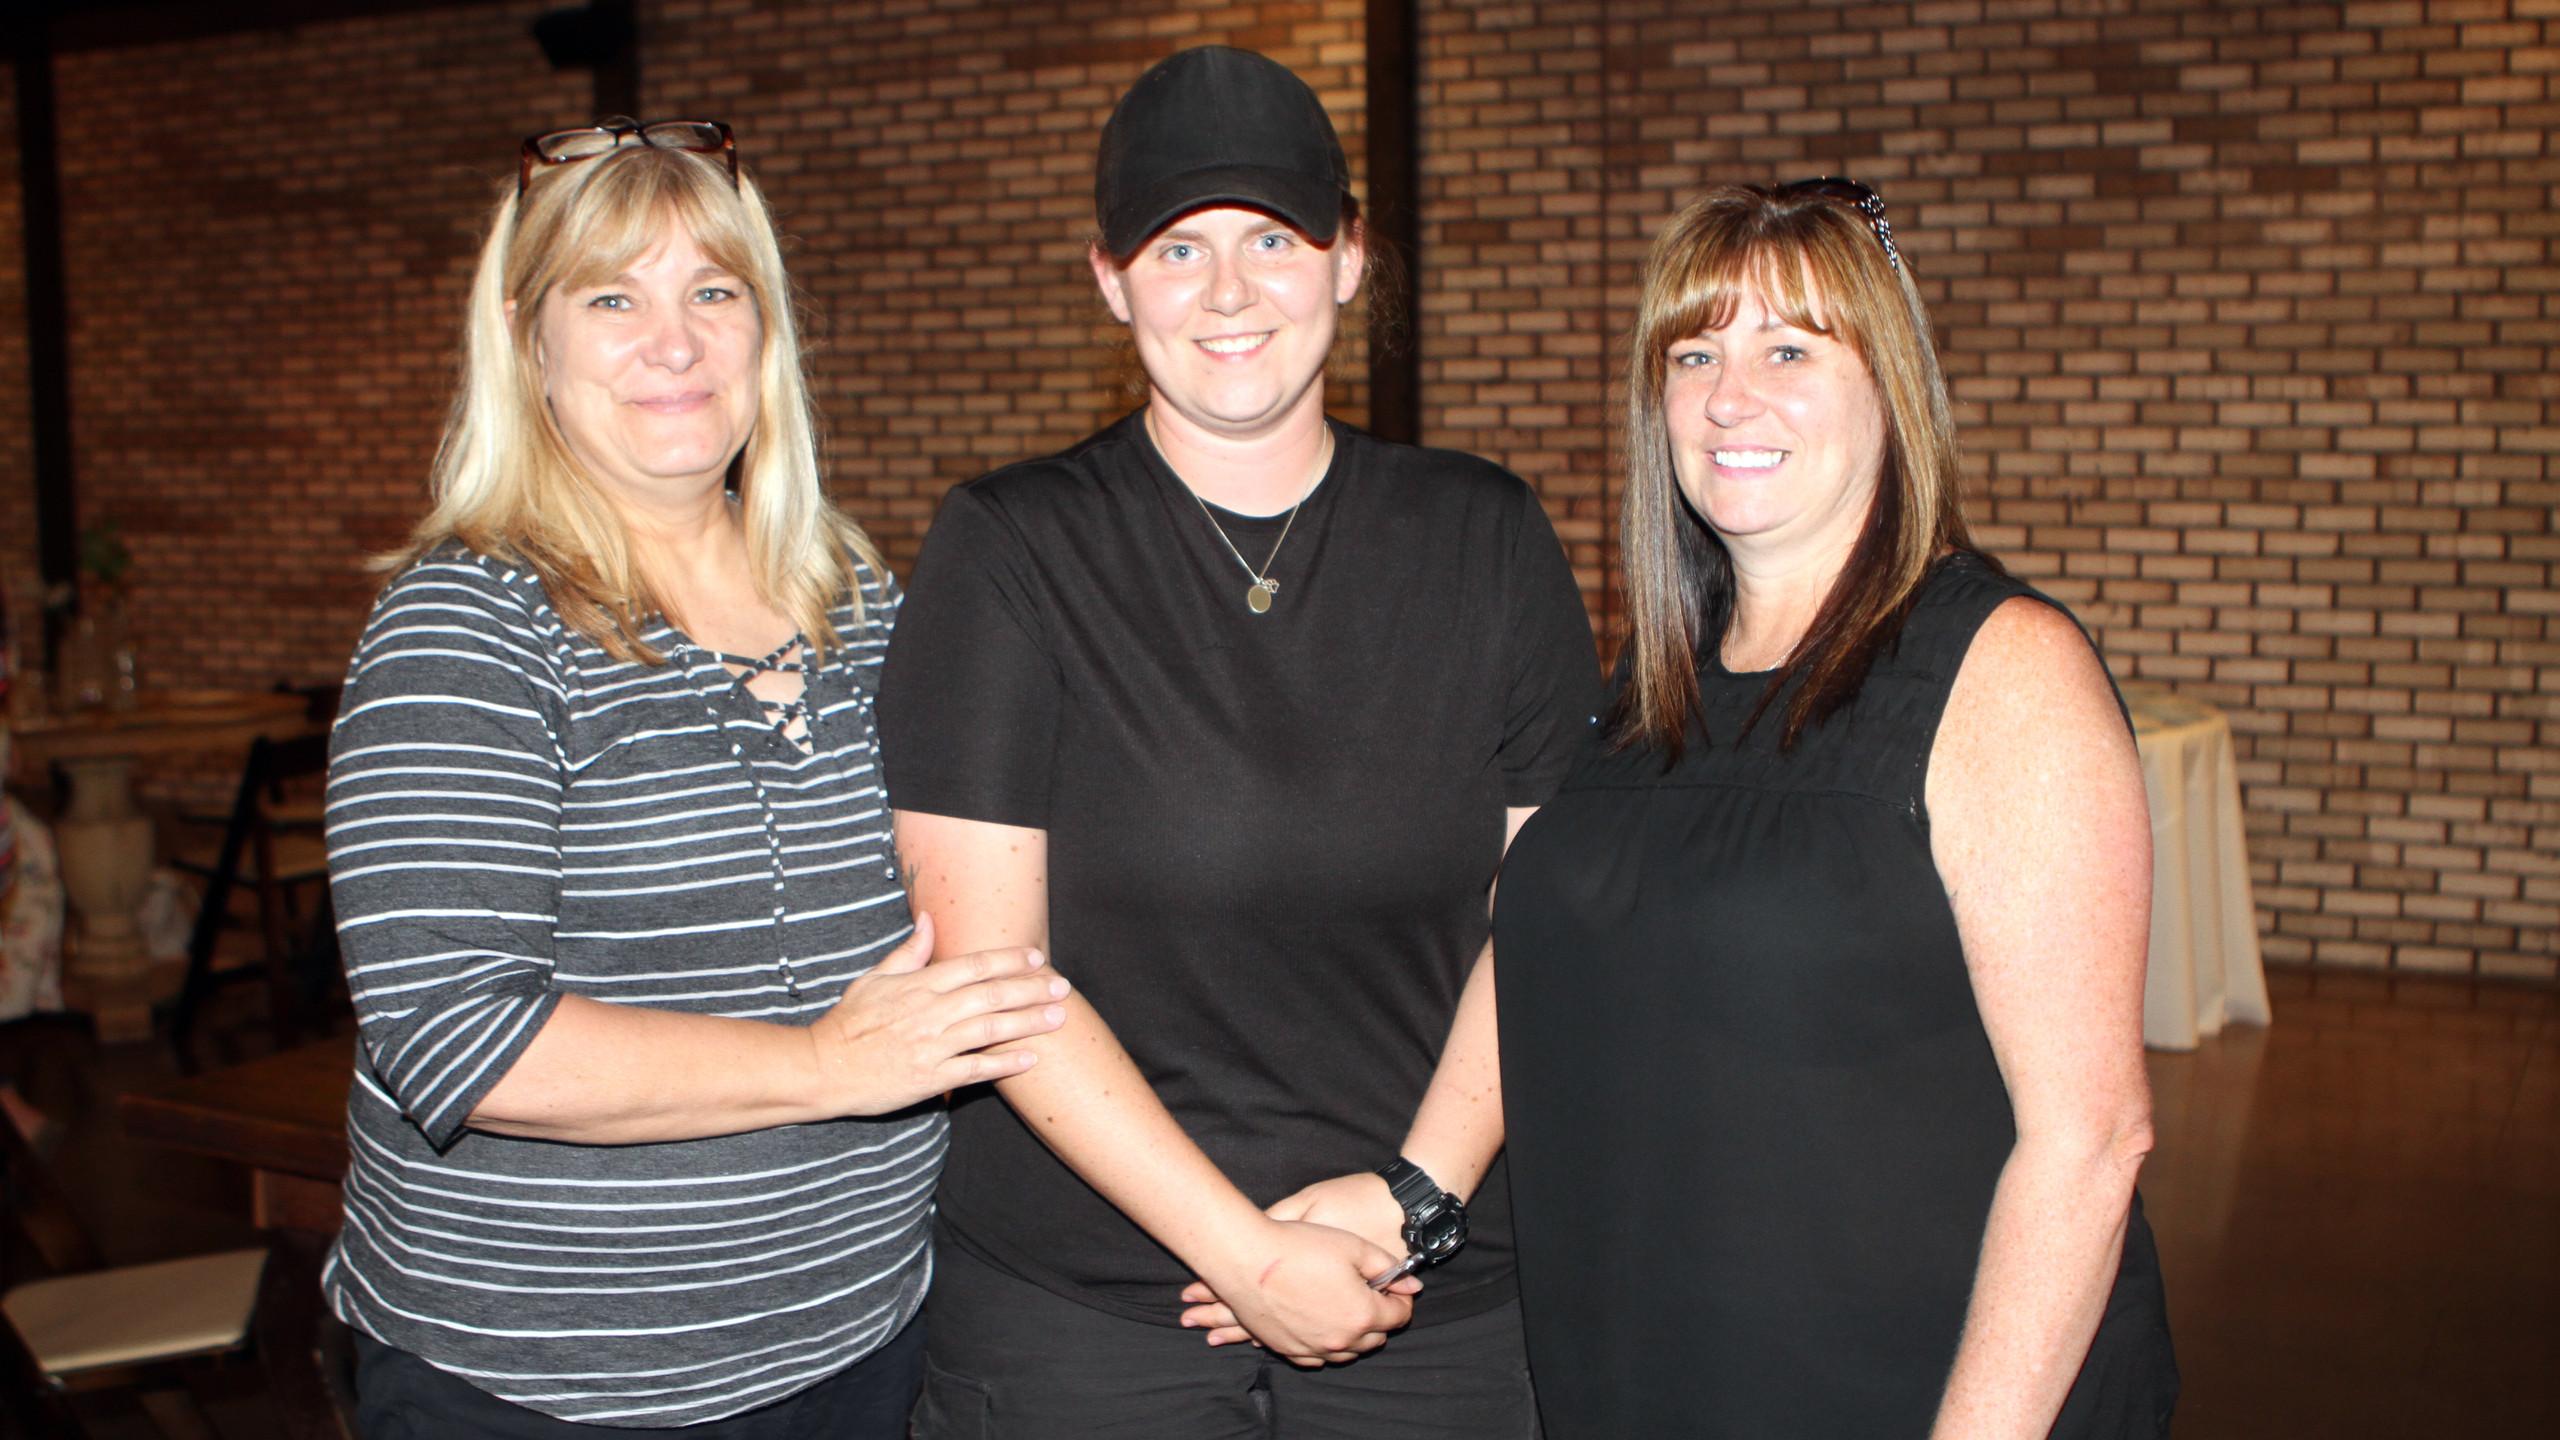 Robin Weeks, Courtney & Gina Louk